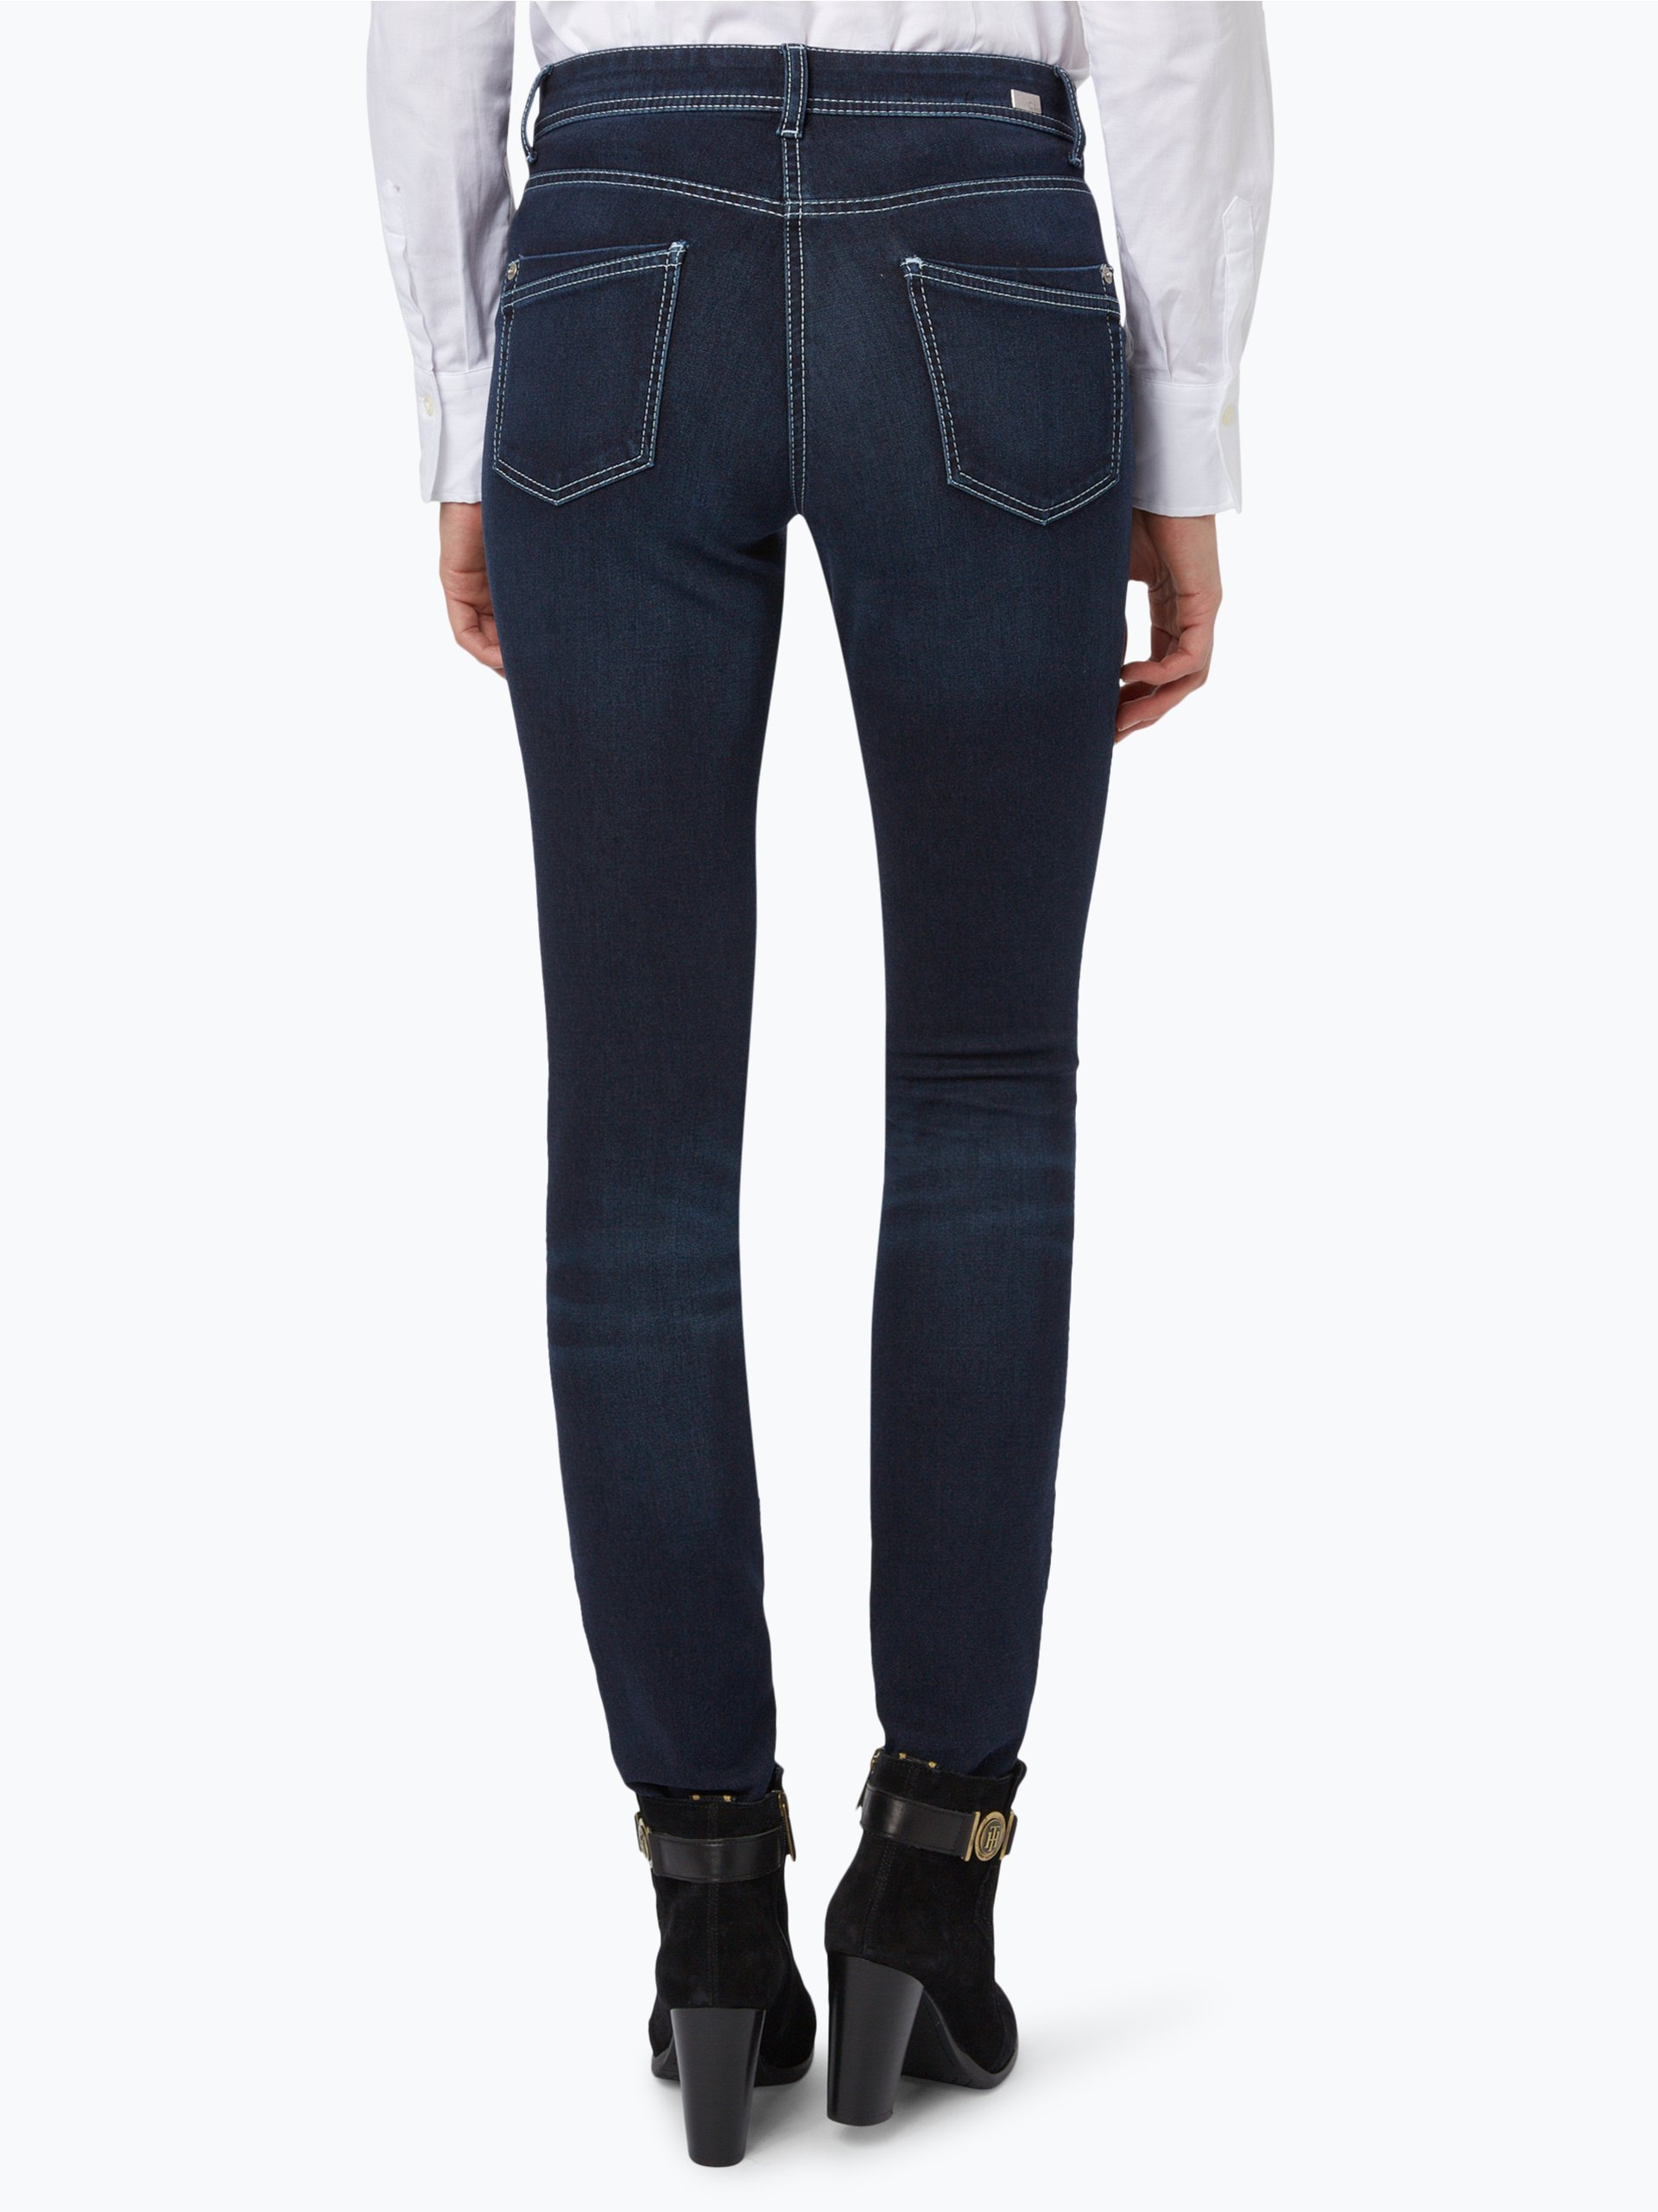 cambio damen jeans parla rinsed uni online kaufen peek und cloppenburg de. Black Bedroom Furniture Sets. Home Design Ideas